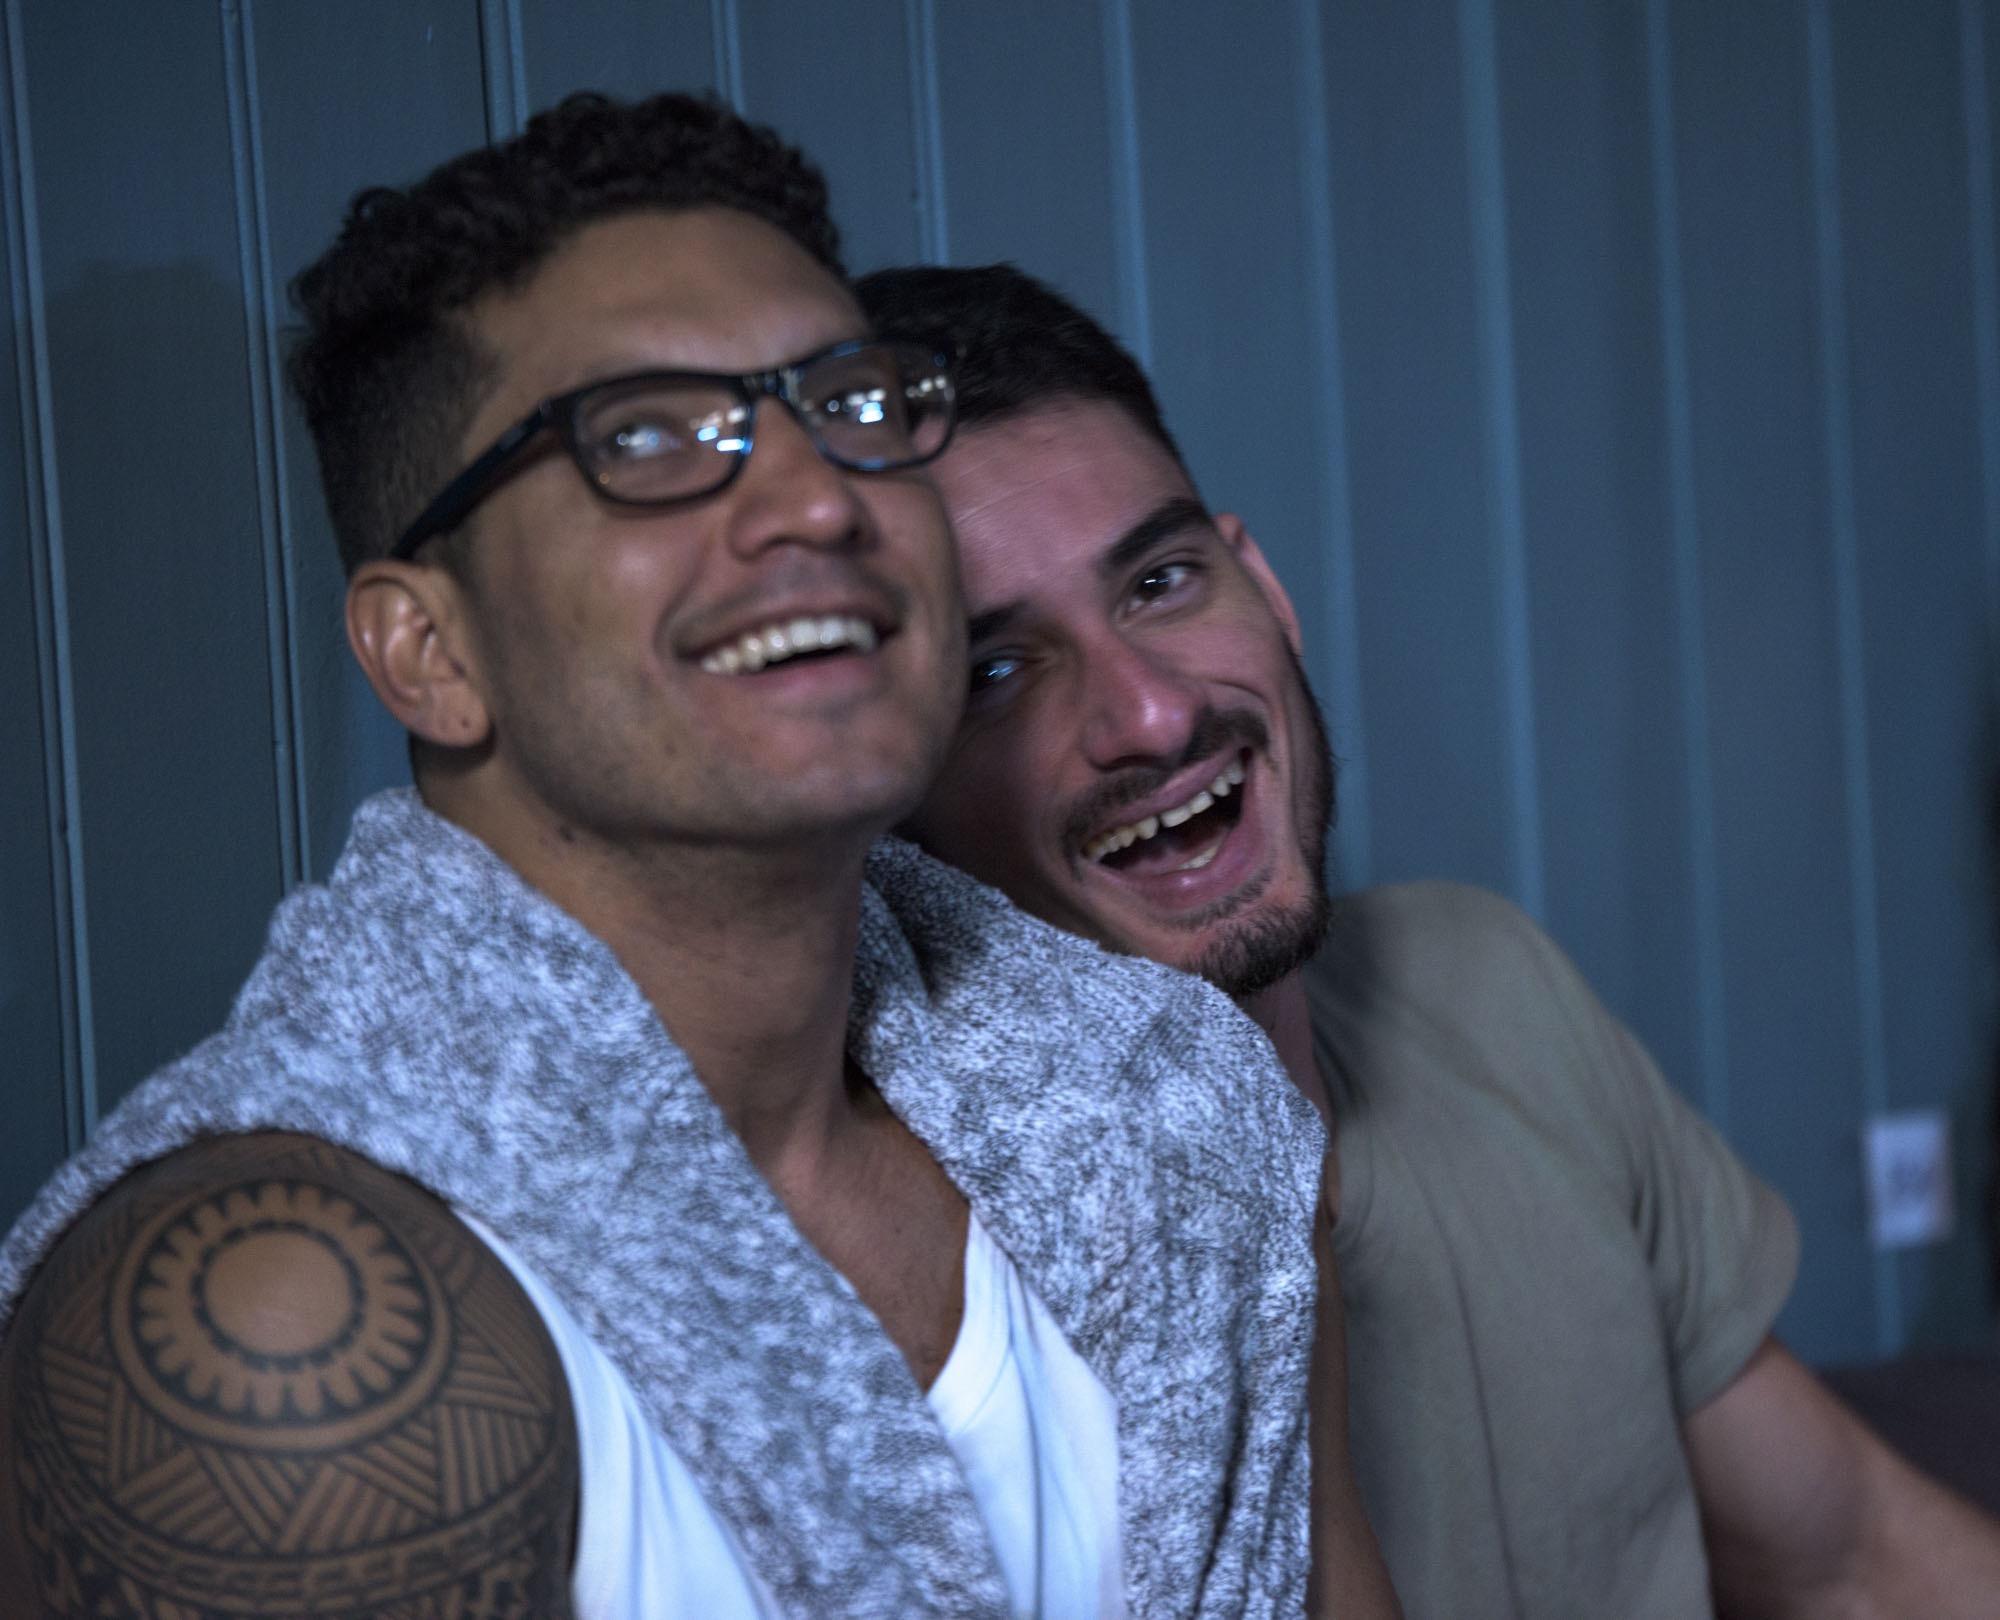 Bruno Serravalle & Jonathan Gonzalez Reyes 1 ©Frederic Garcia.jpg